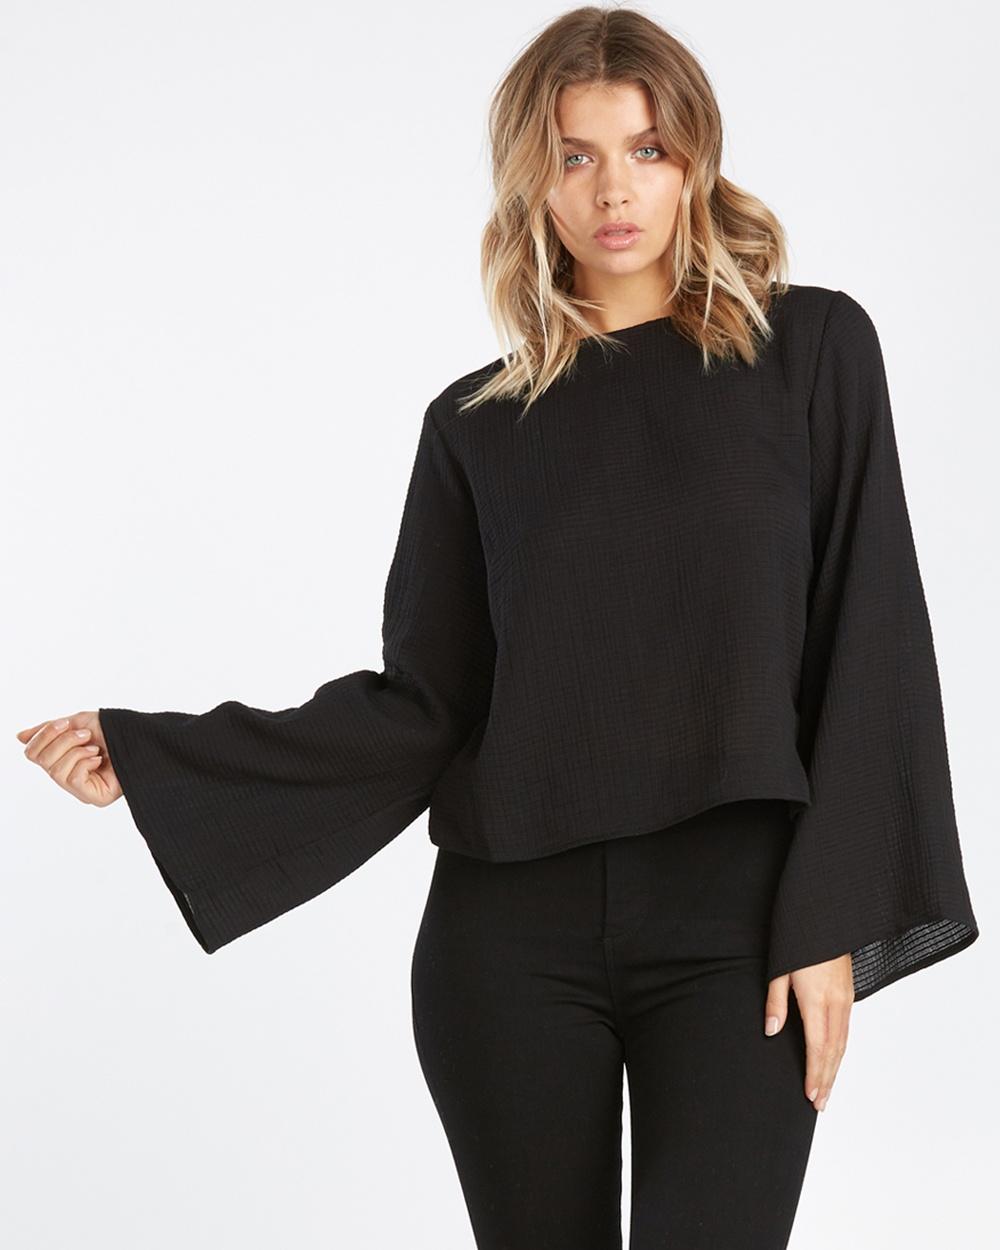 Calli Cassa Bell Sleeve Top Cropped tops Black Cassa Bell-Sleeve Top